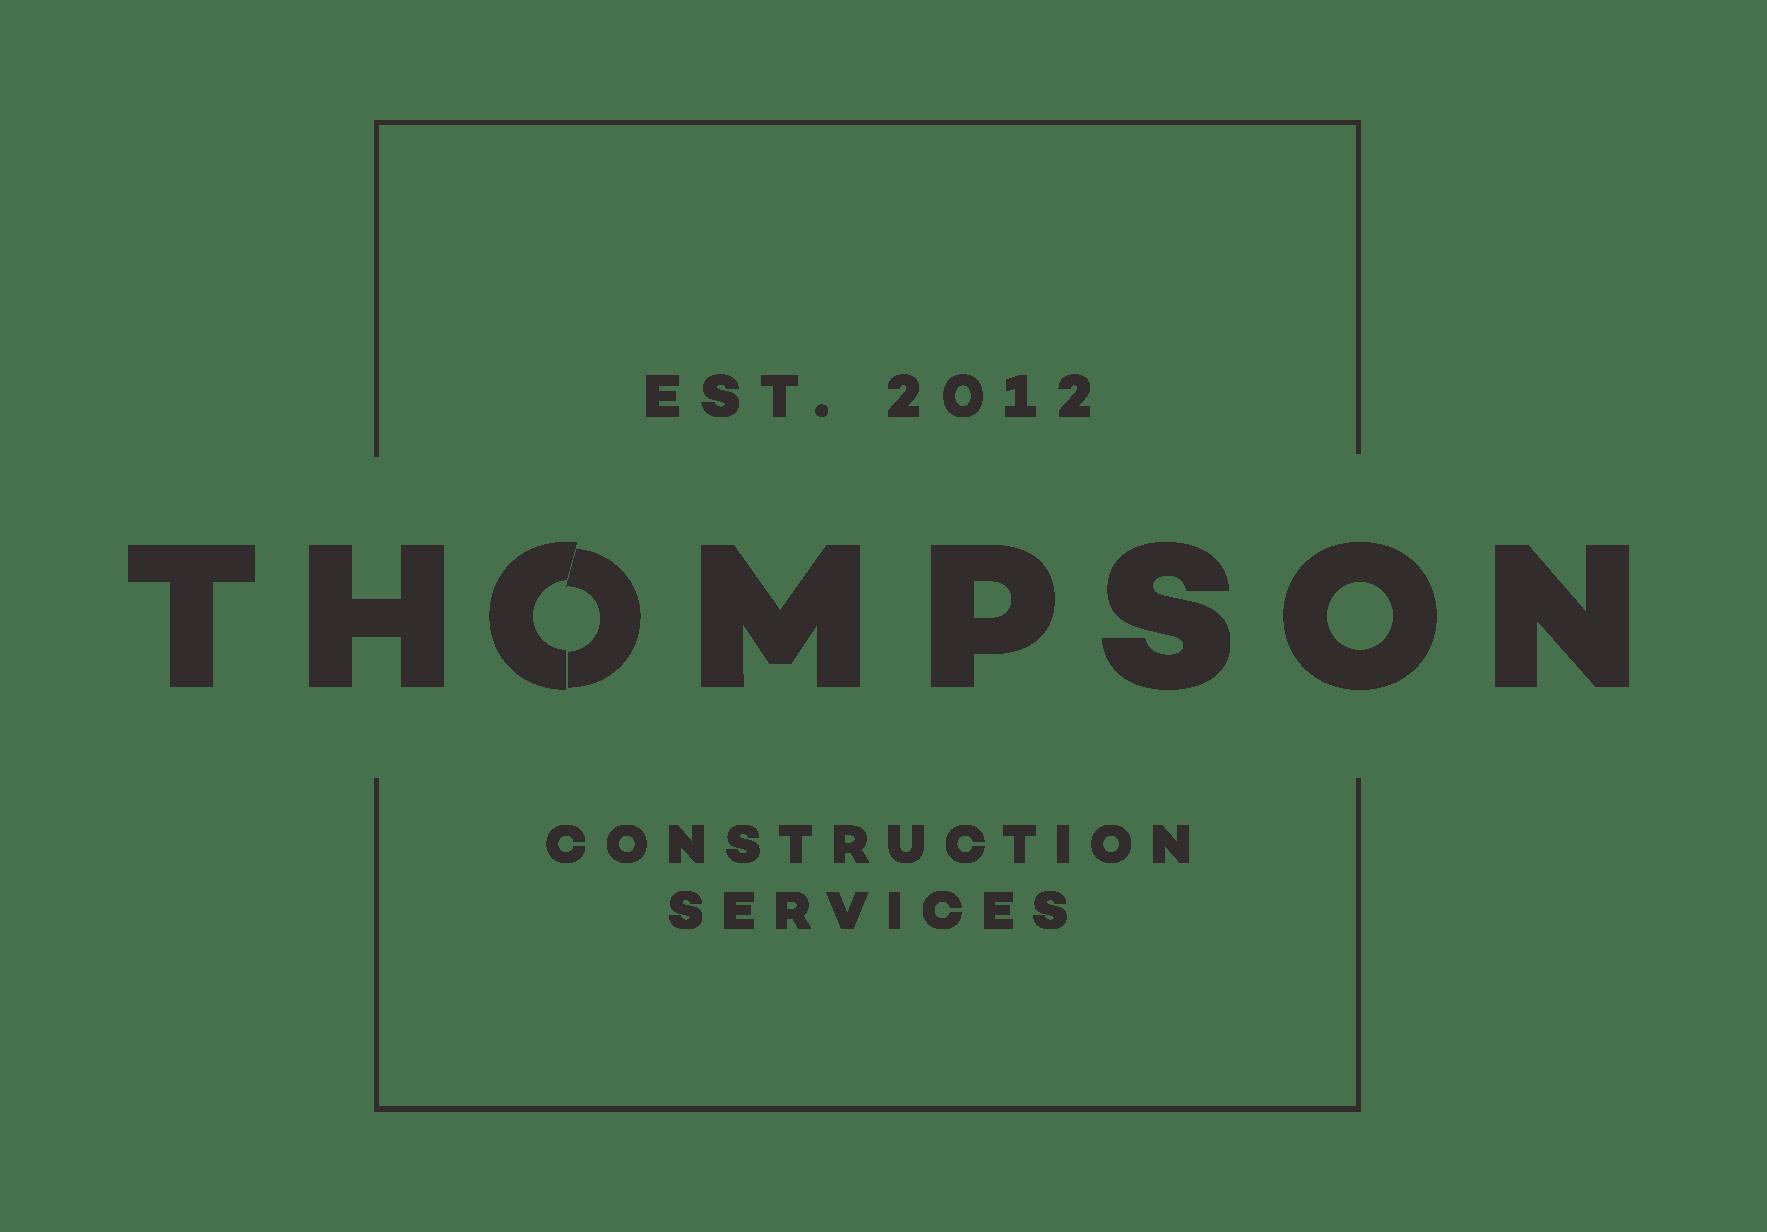 Thompson Construction Services - Established 2012